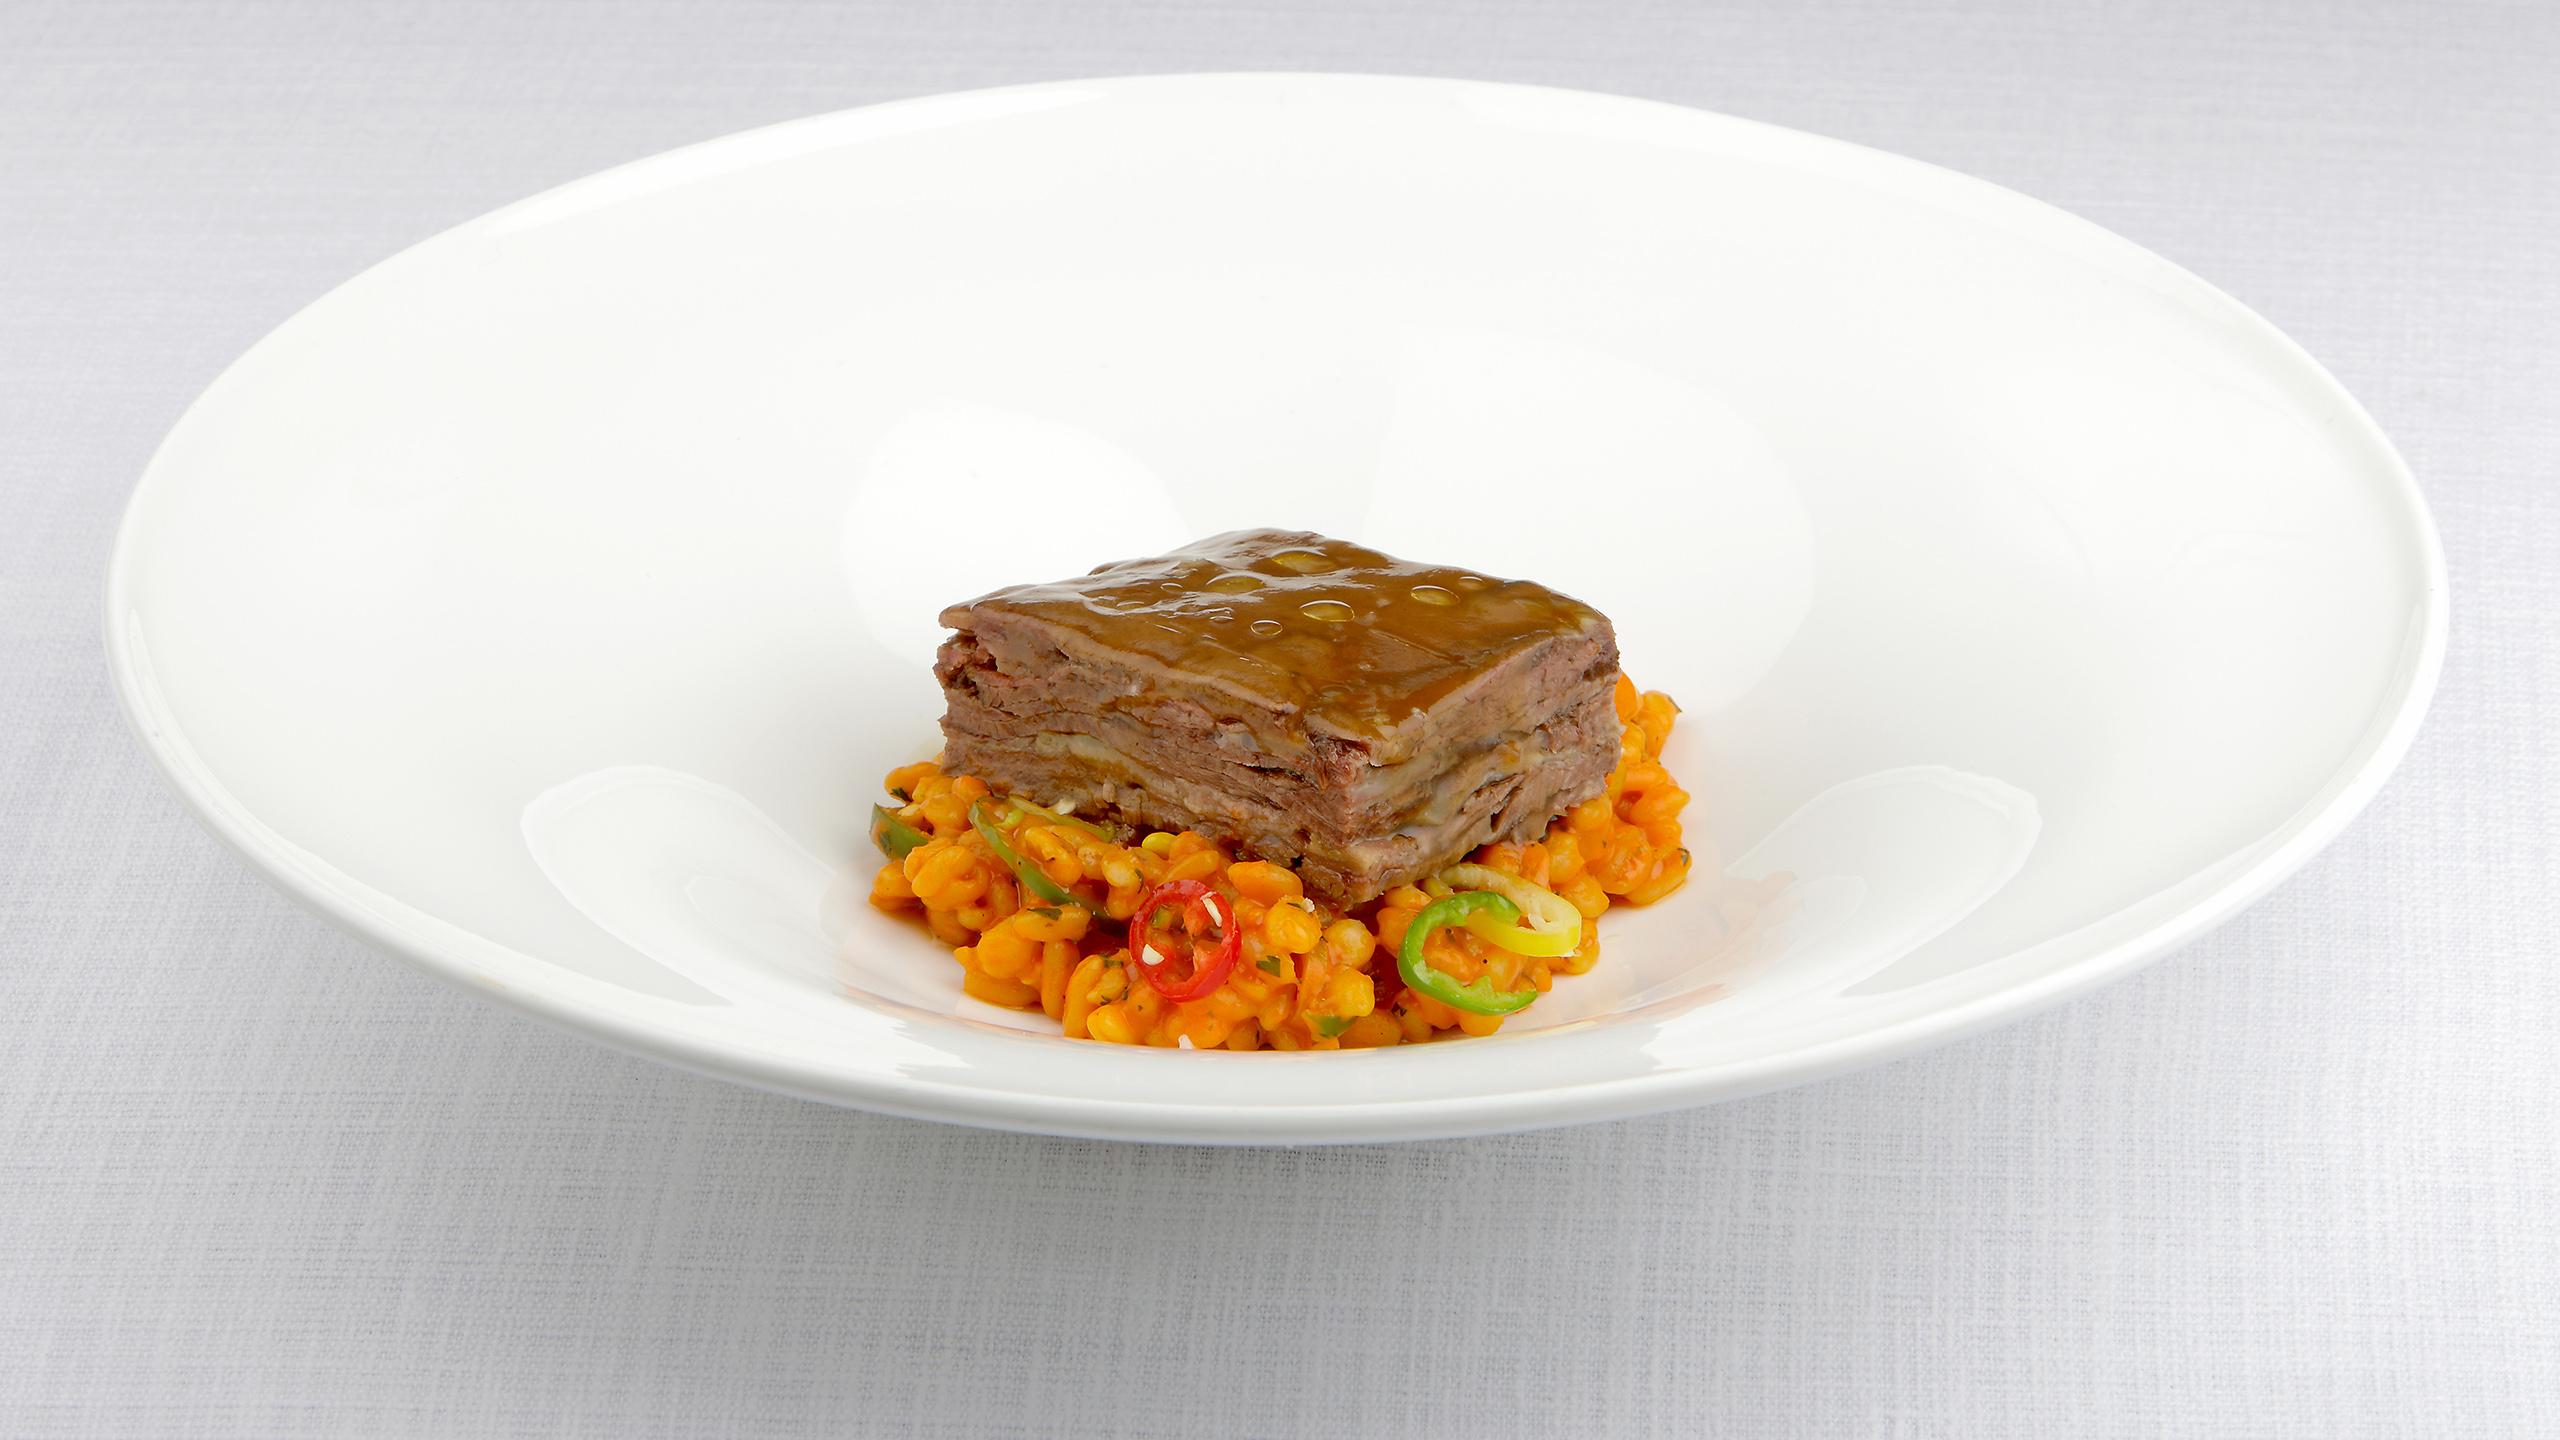 gastronomia 63 tafona